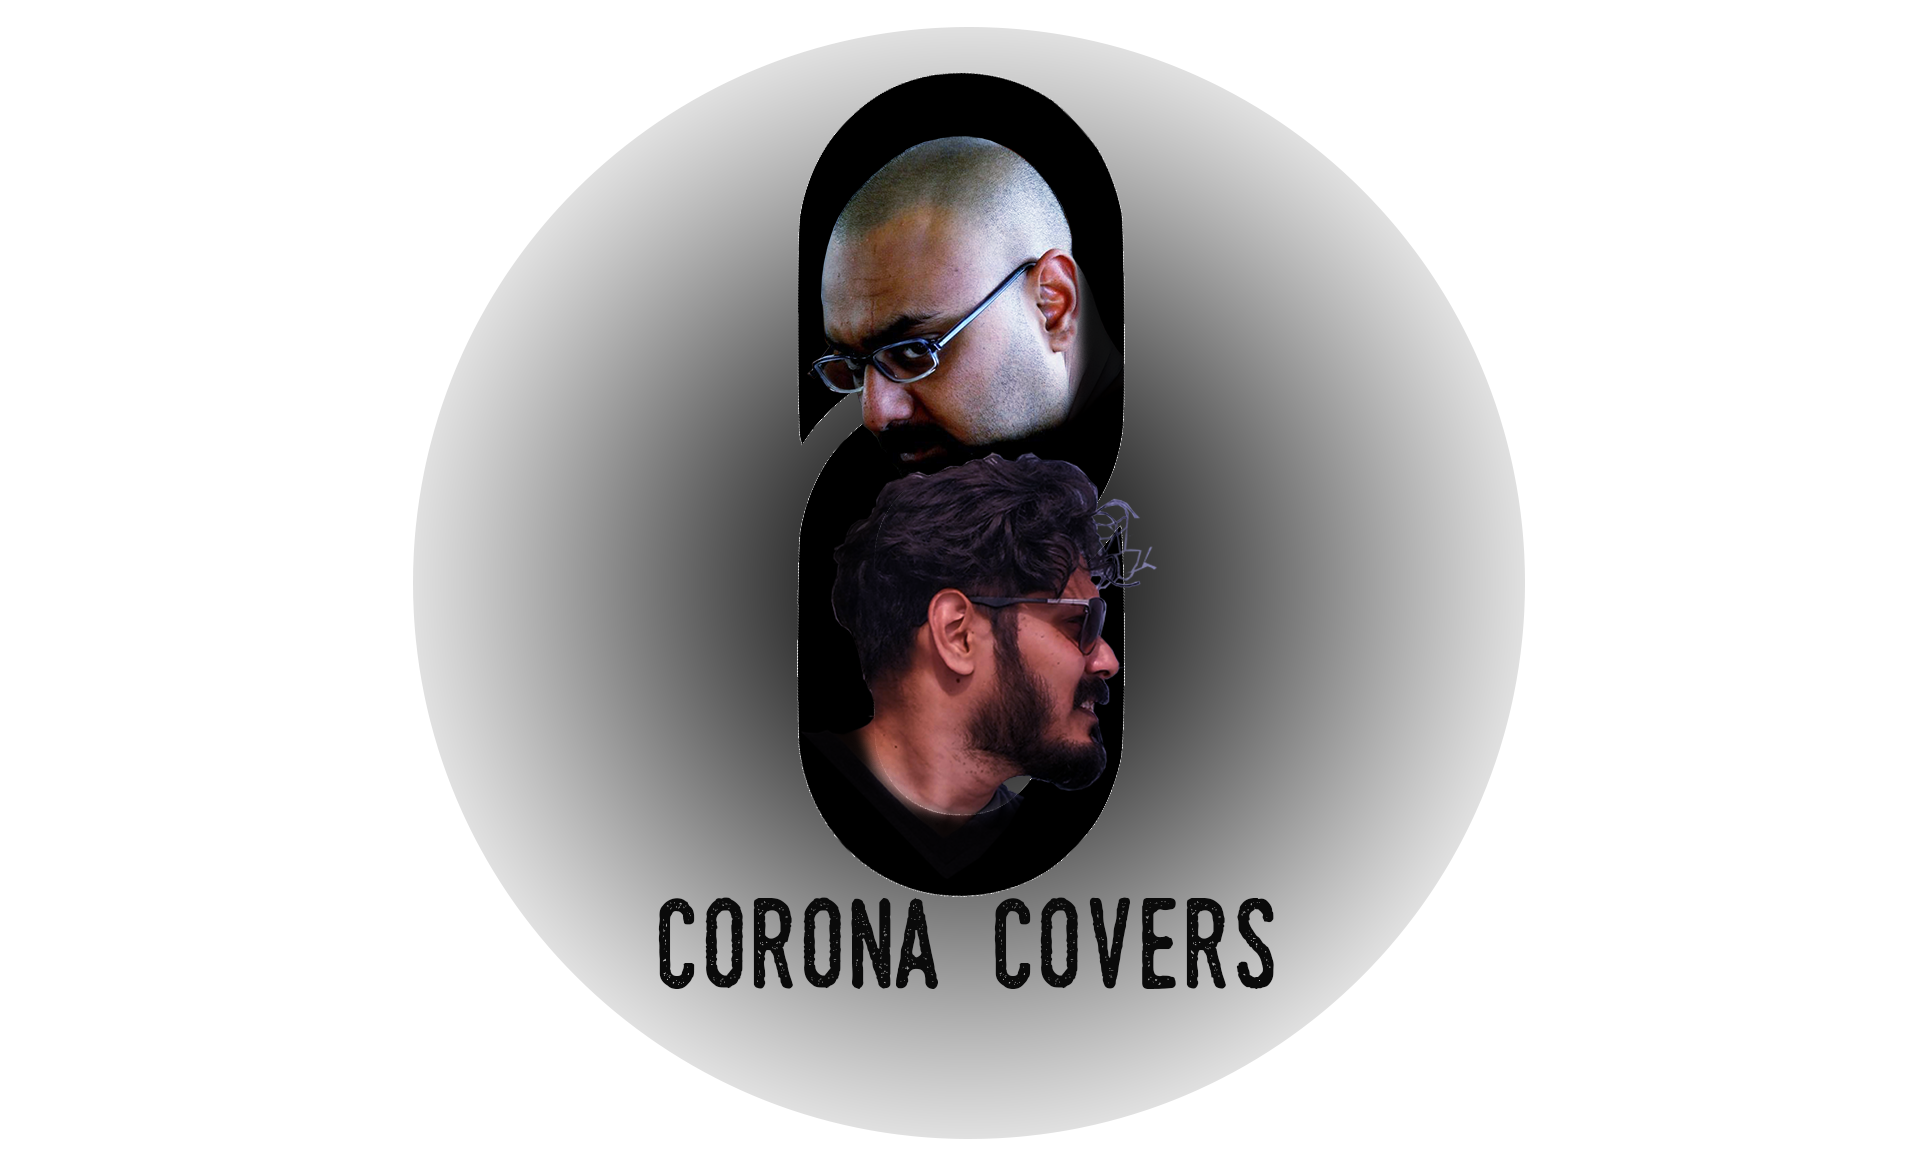 Corona Covers